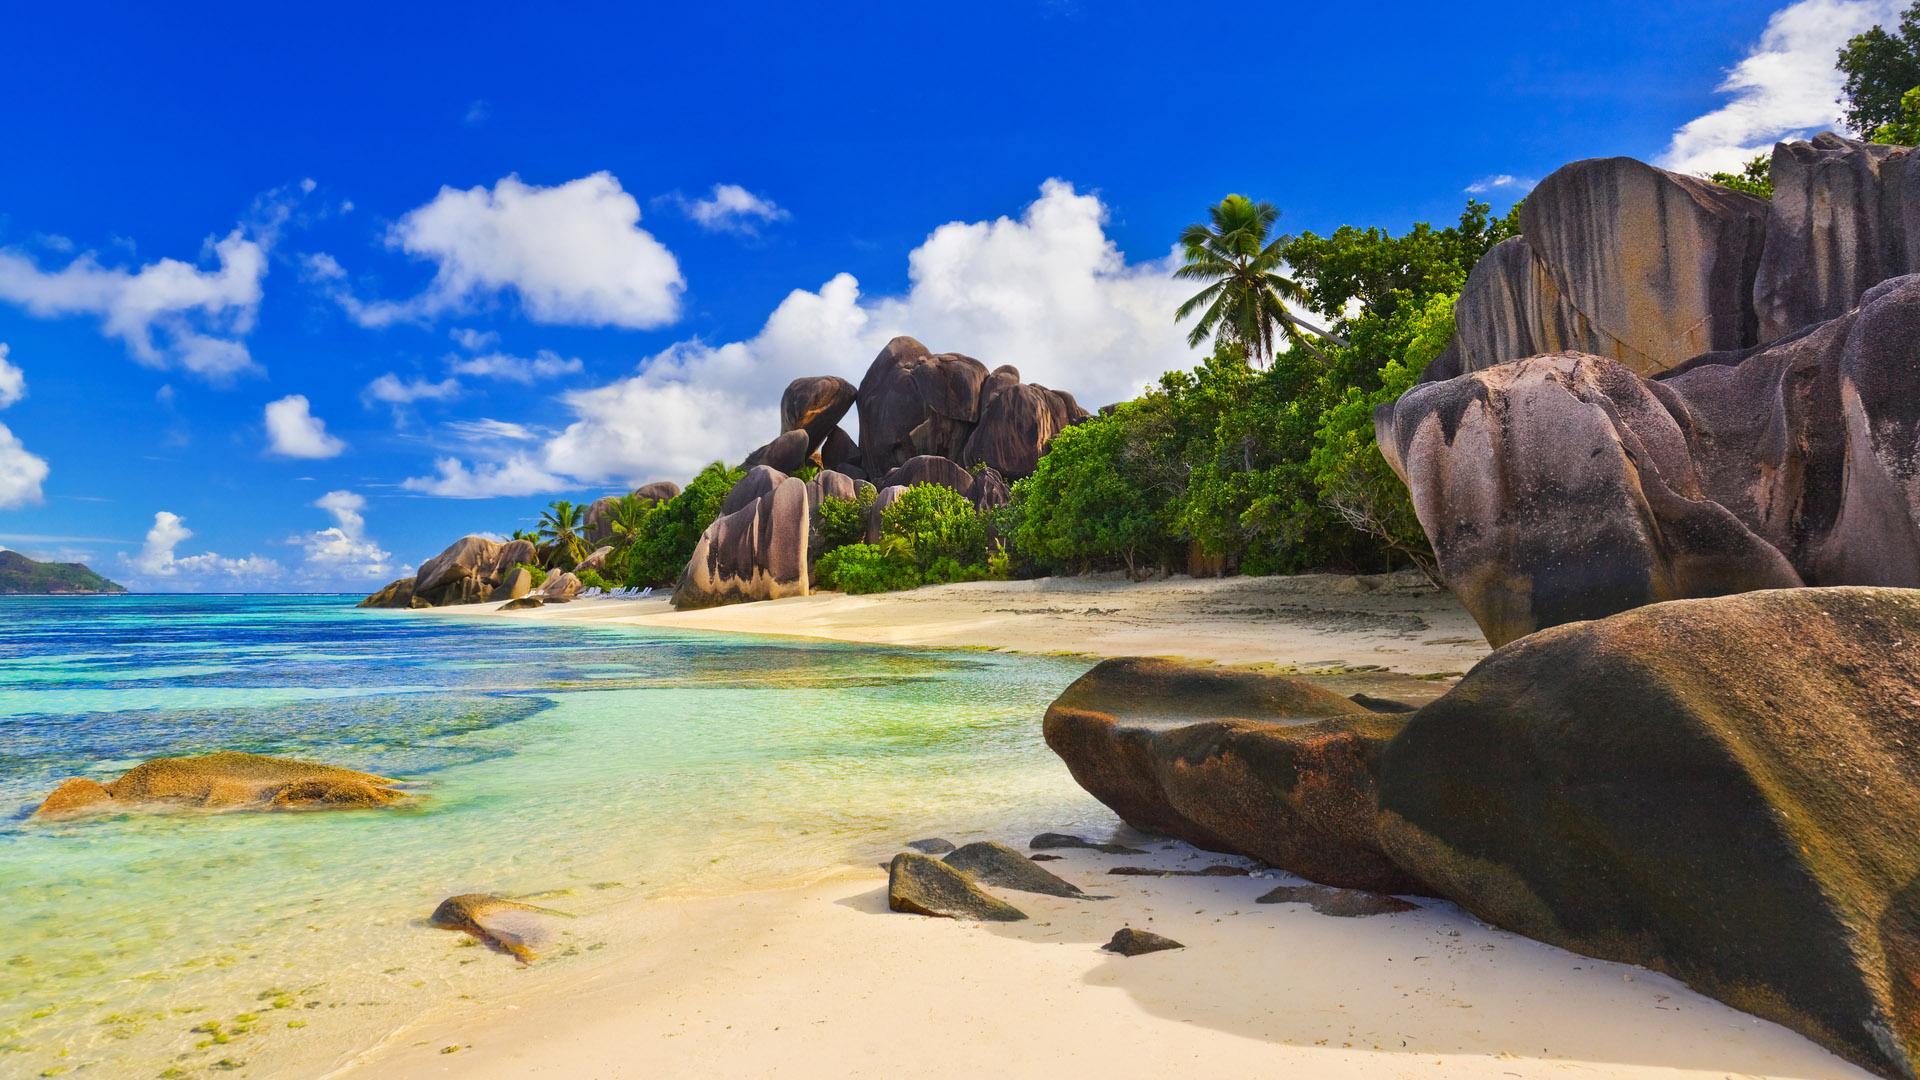 amazing tropical beach 1920x1080